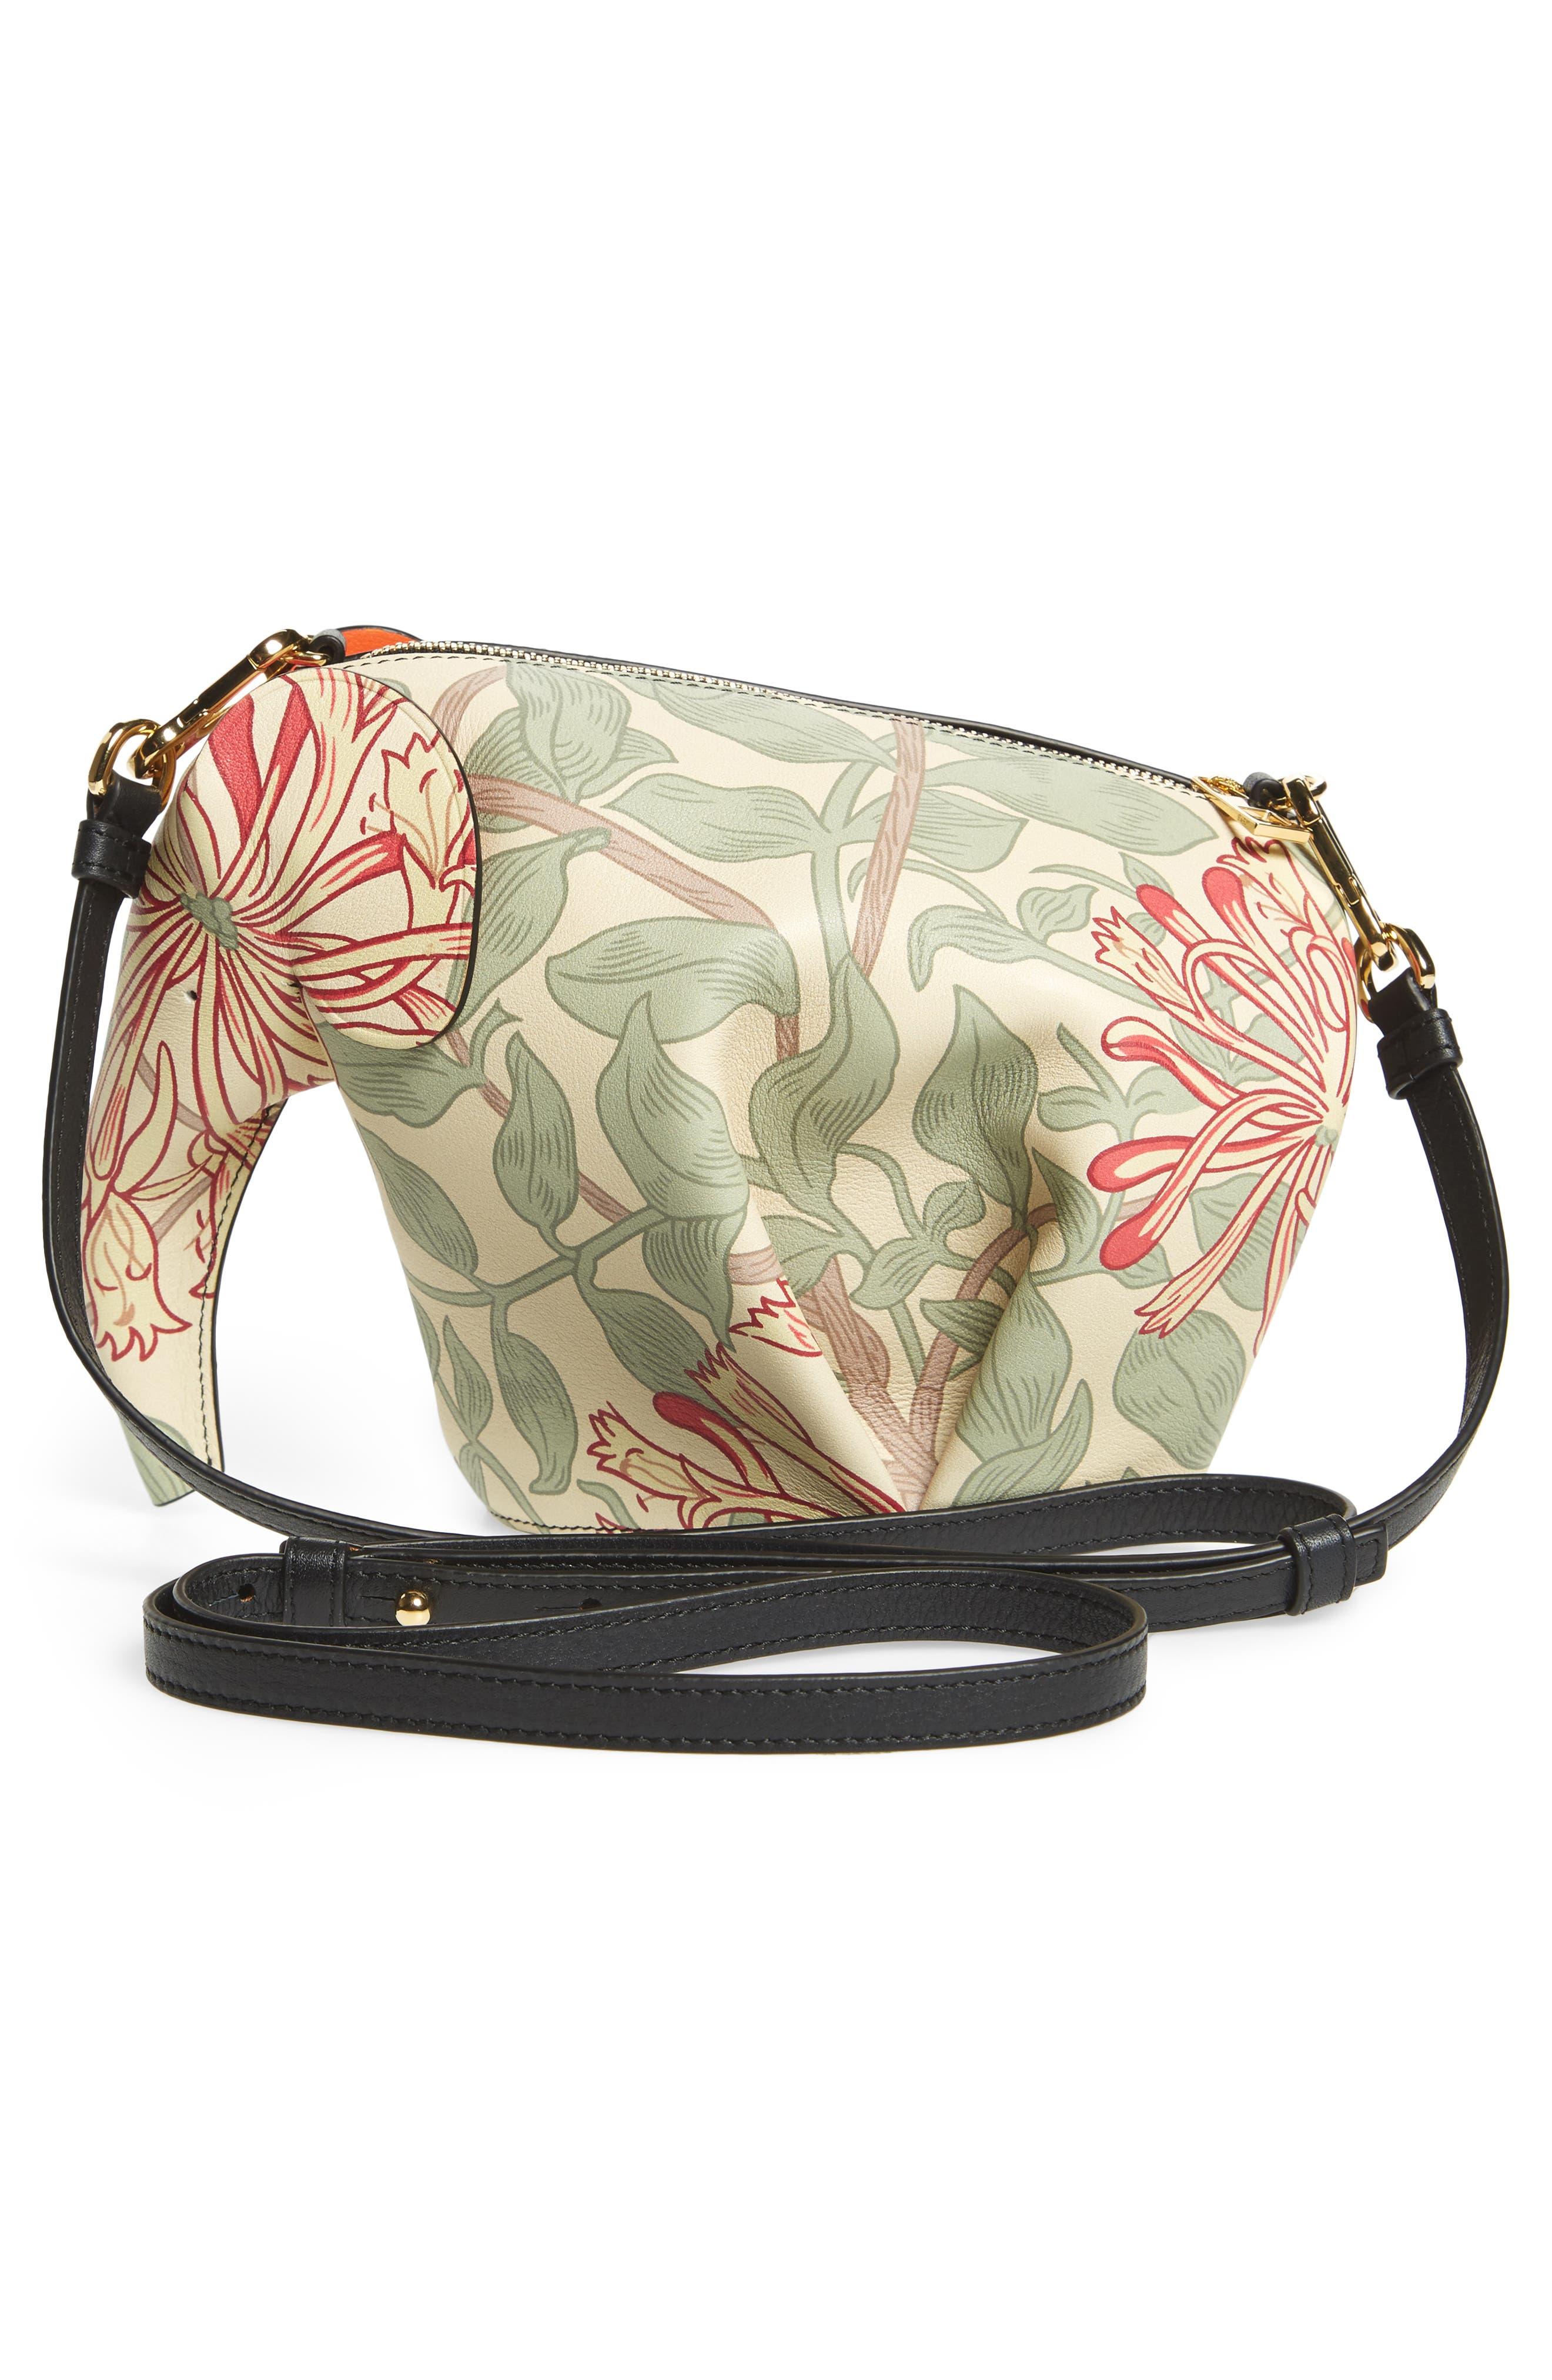 Mini Elephant Honeysuckle Print Leather Crossbody Bag,                             Alternate thumbnail 3, color,                             Beige/ Green/ Multicolour